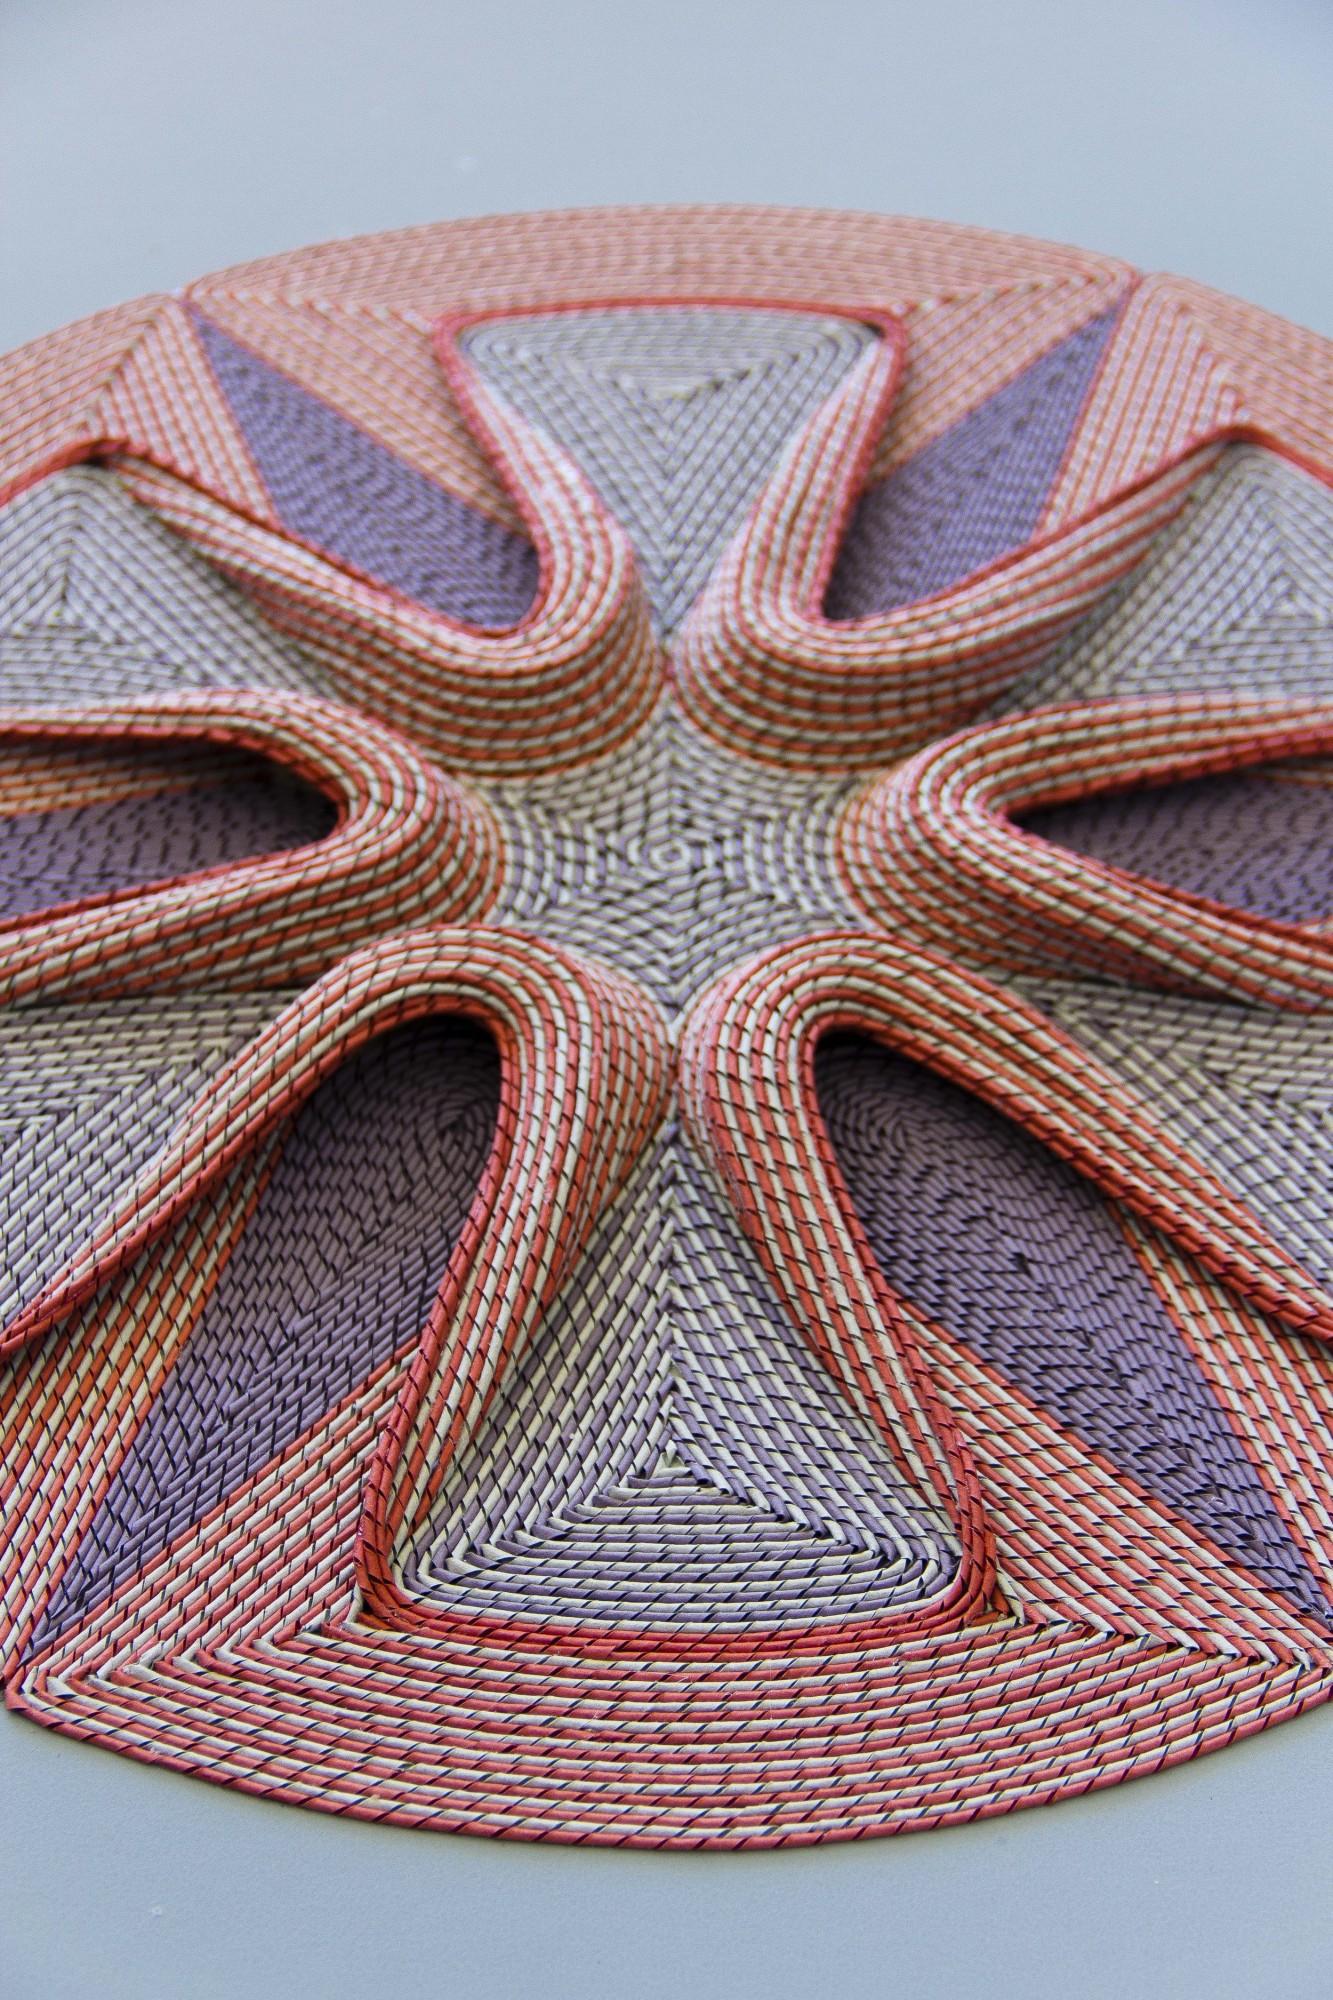 New Intricate Curled Paper Tapestries by Gunjan Aylawadi - Blossom